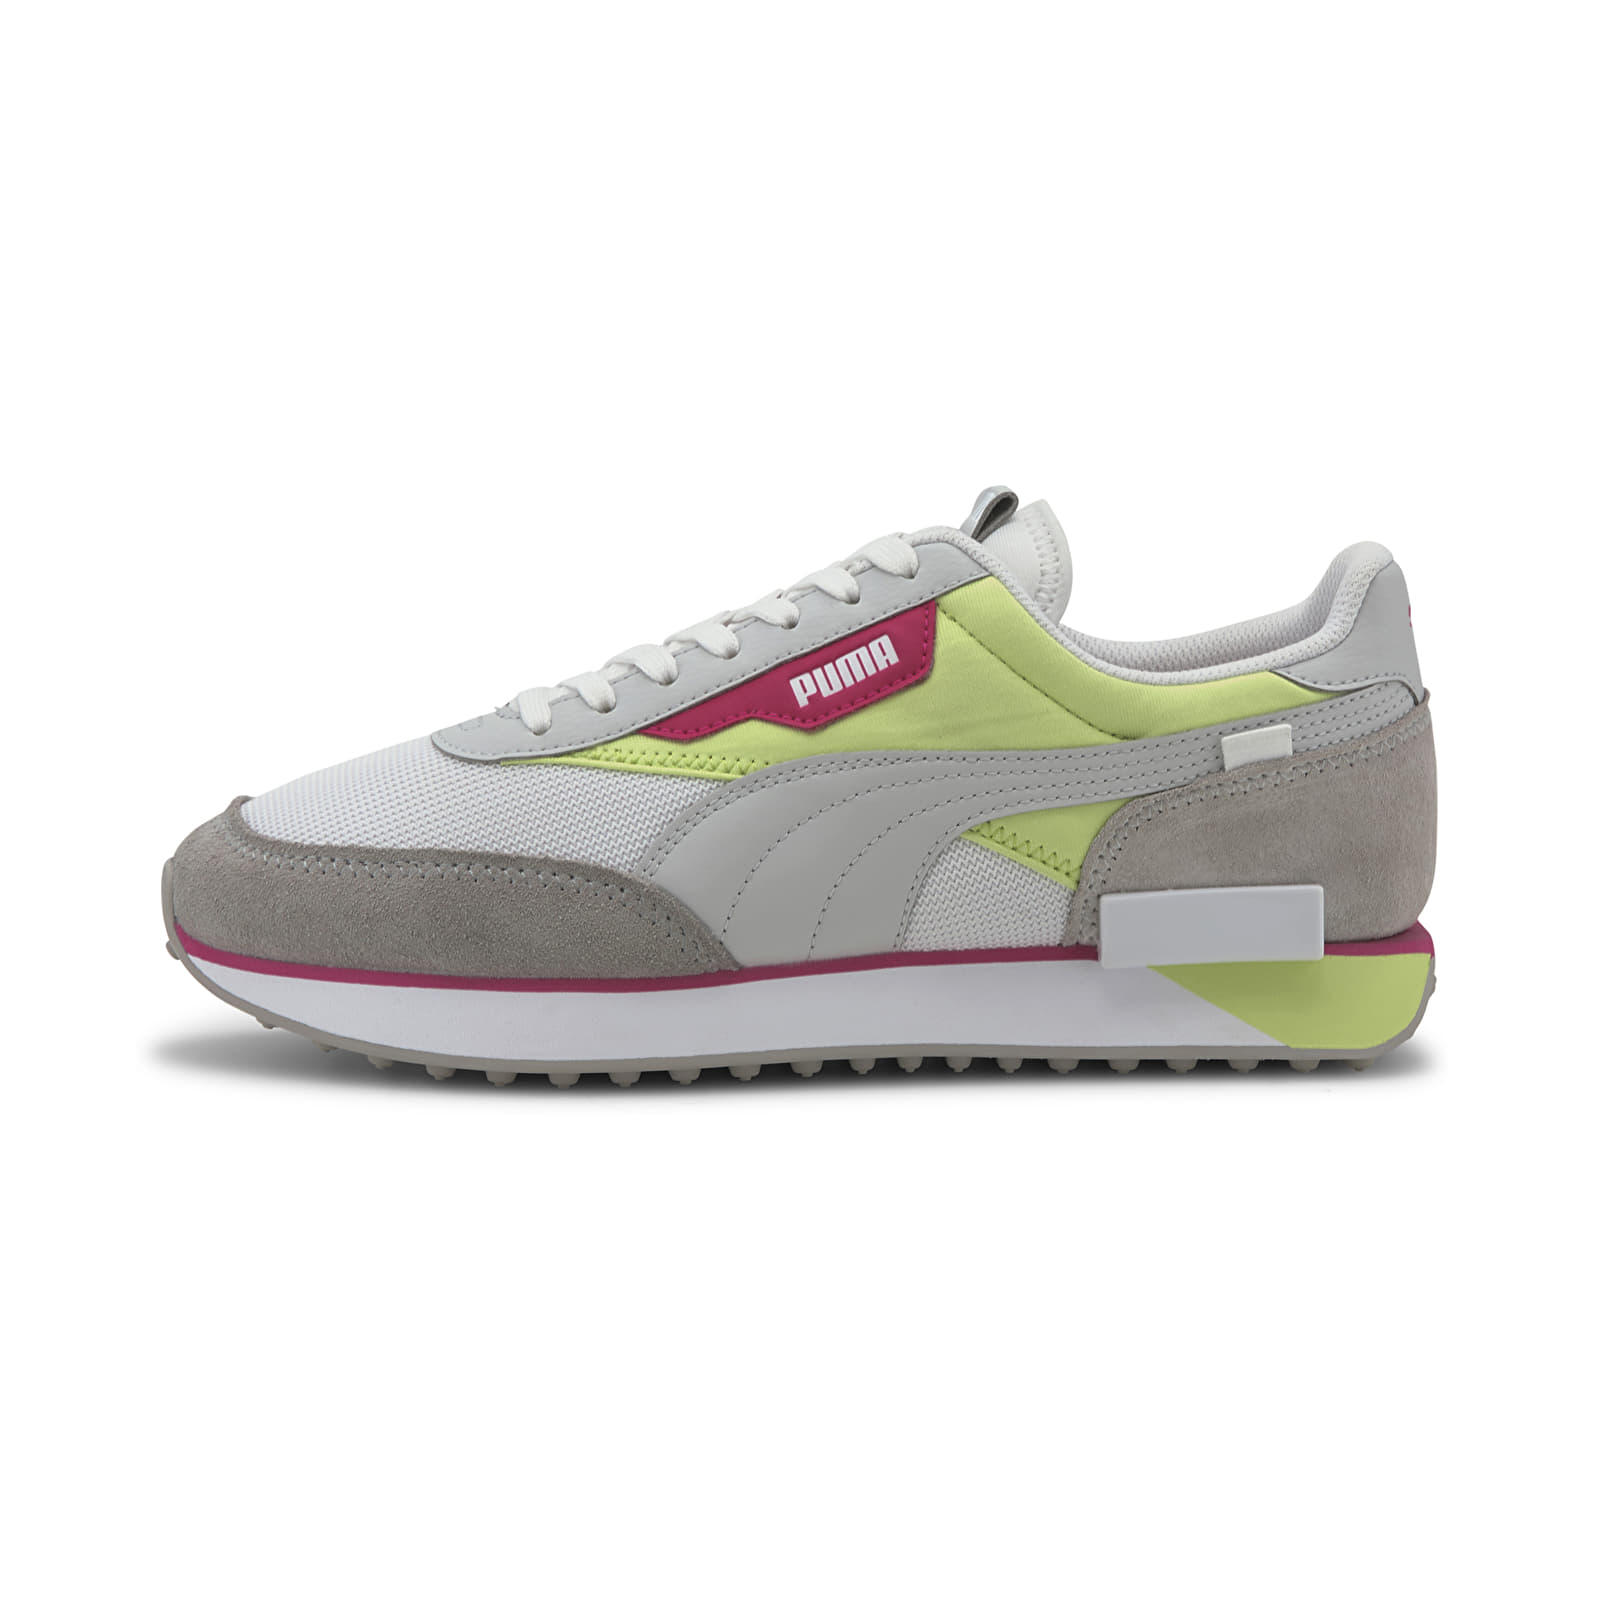 Men's shoes Puma Future Rider Neon Play Grey Violet-Sharp Puma Green